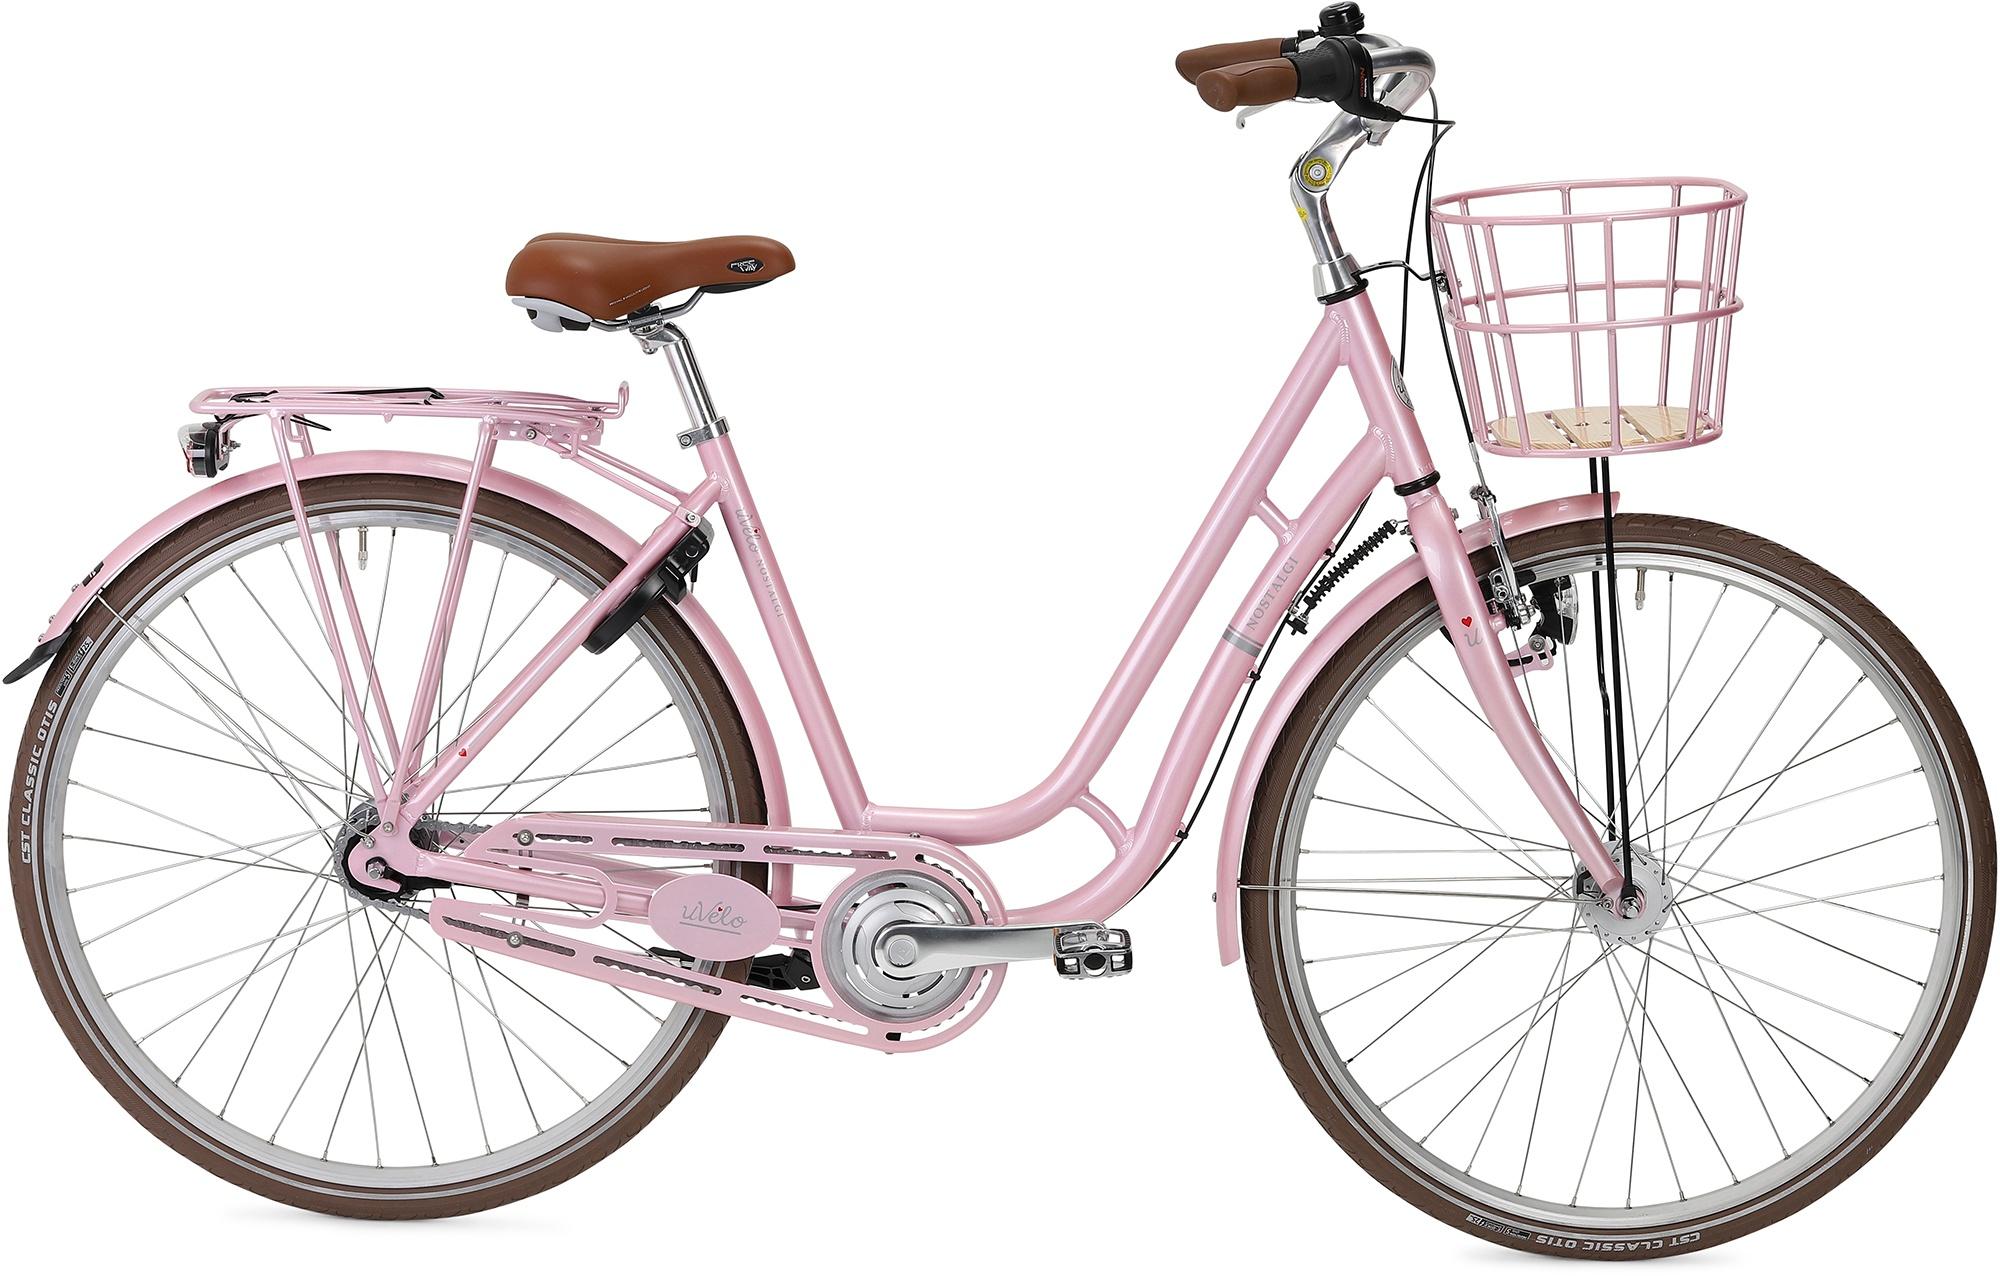 uVélo Nostalgi 7g Dame 2021 - Lyserød  »  Bike Size: 55cm